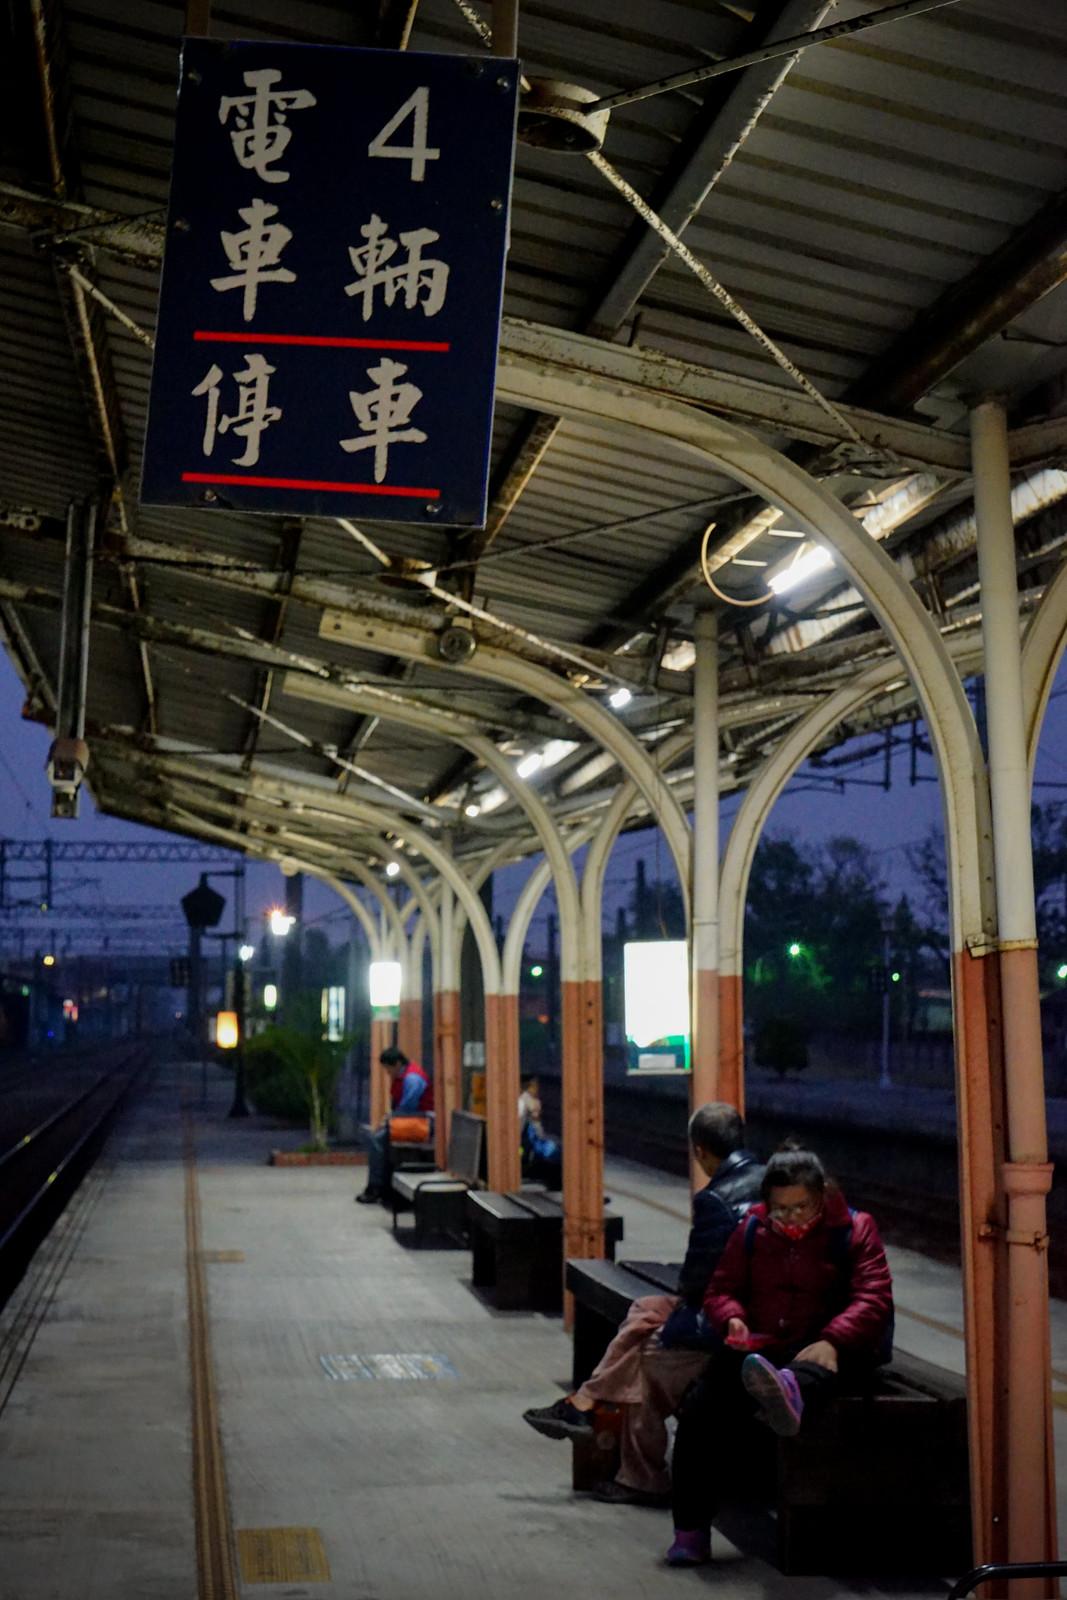 Longtian Station, Taiwan